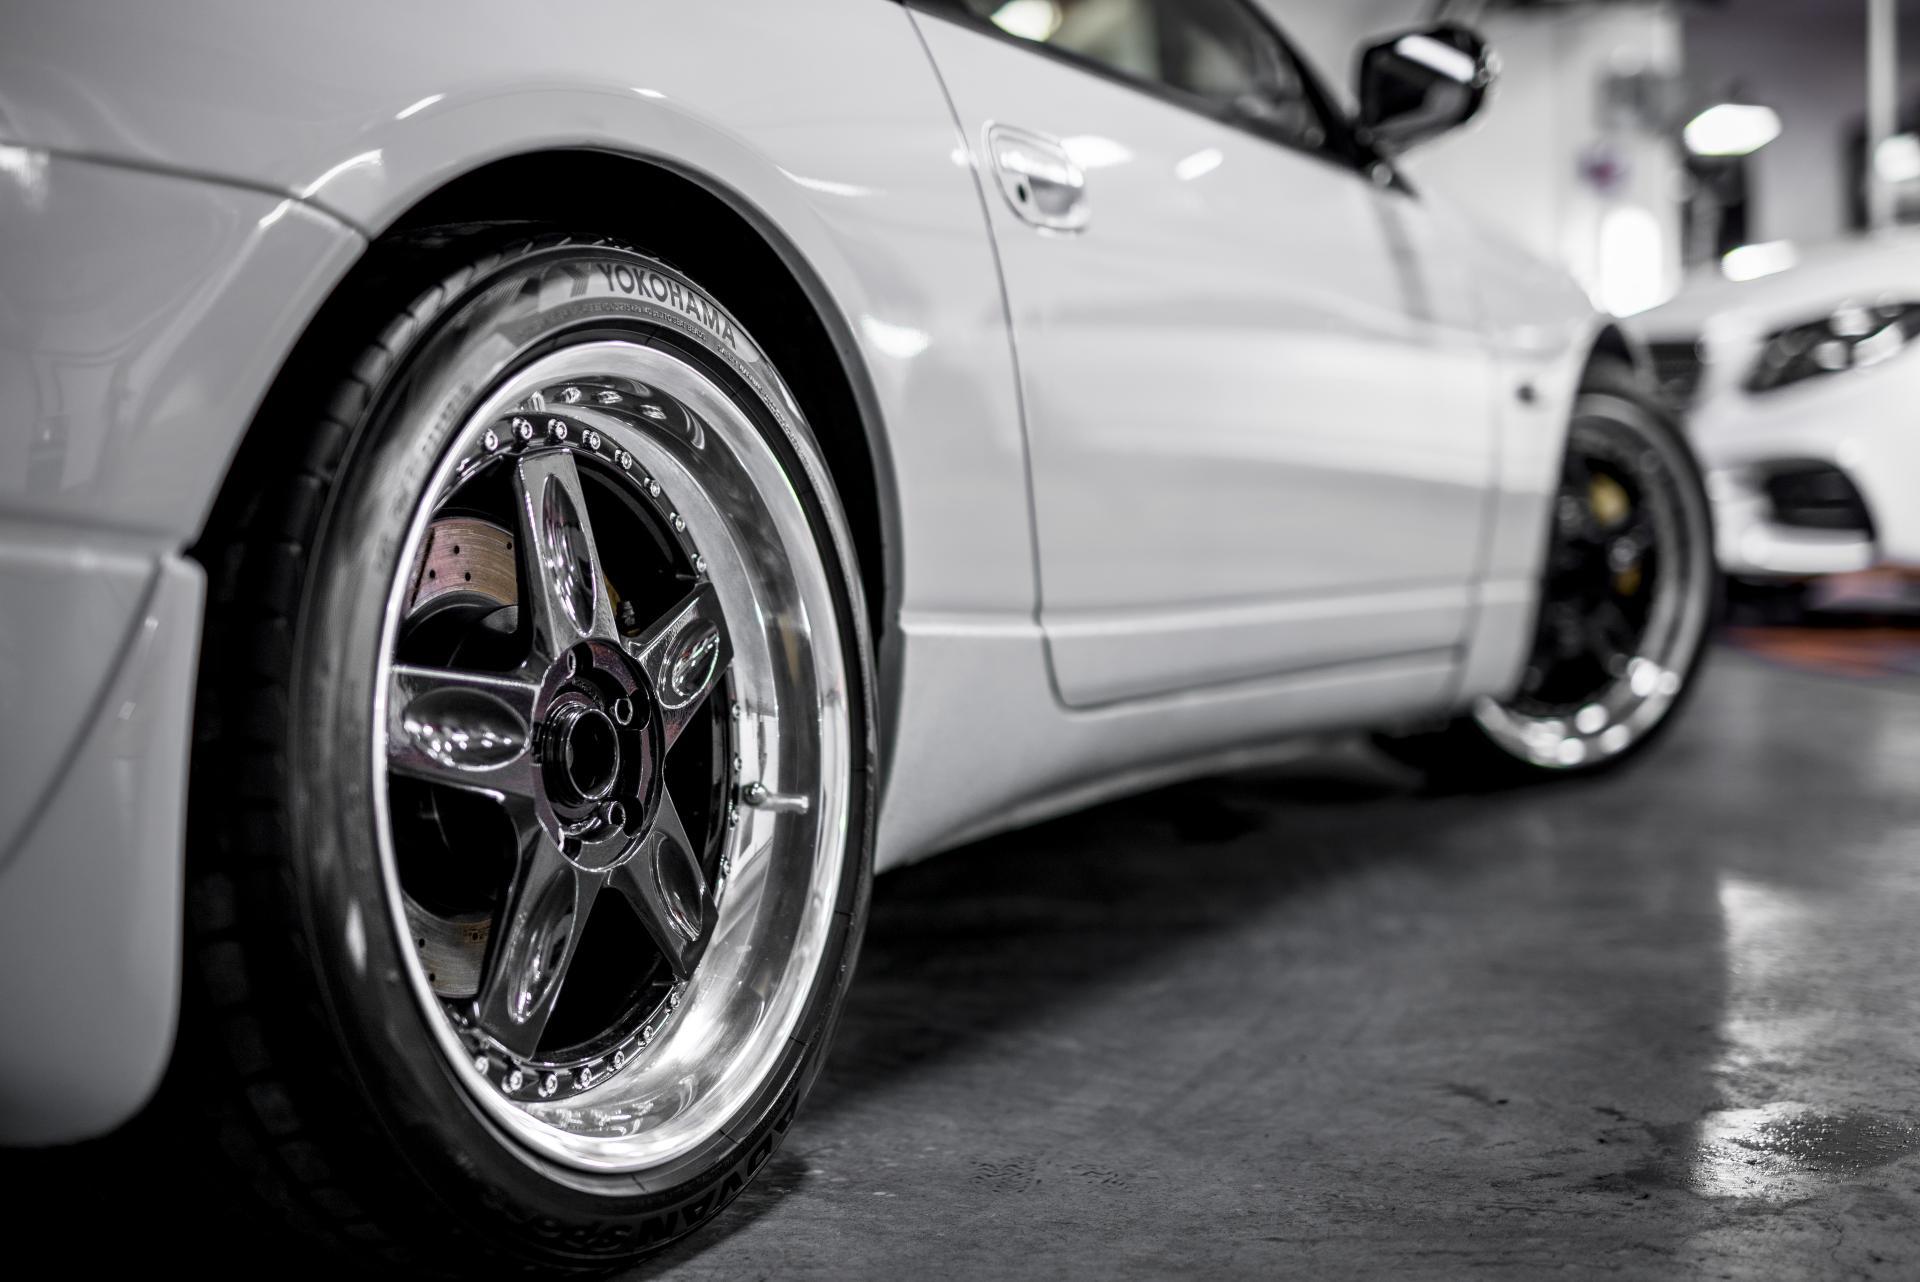 Nissan 300zx detal